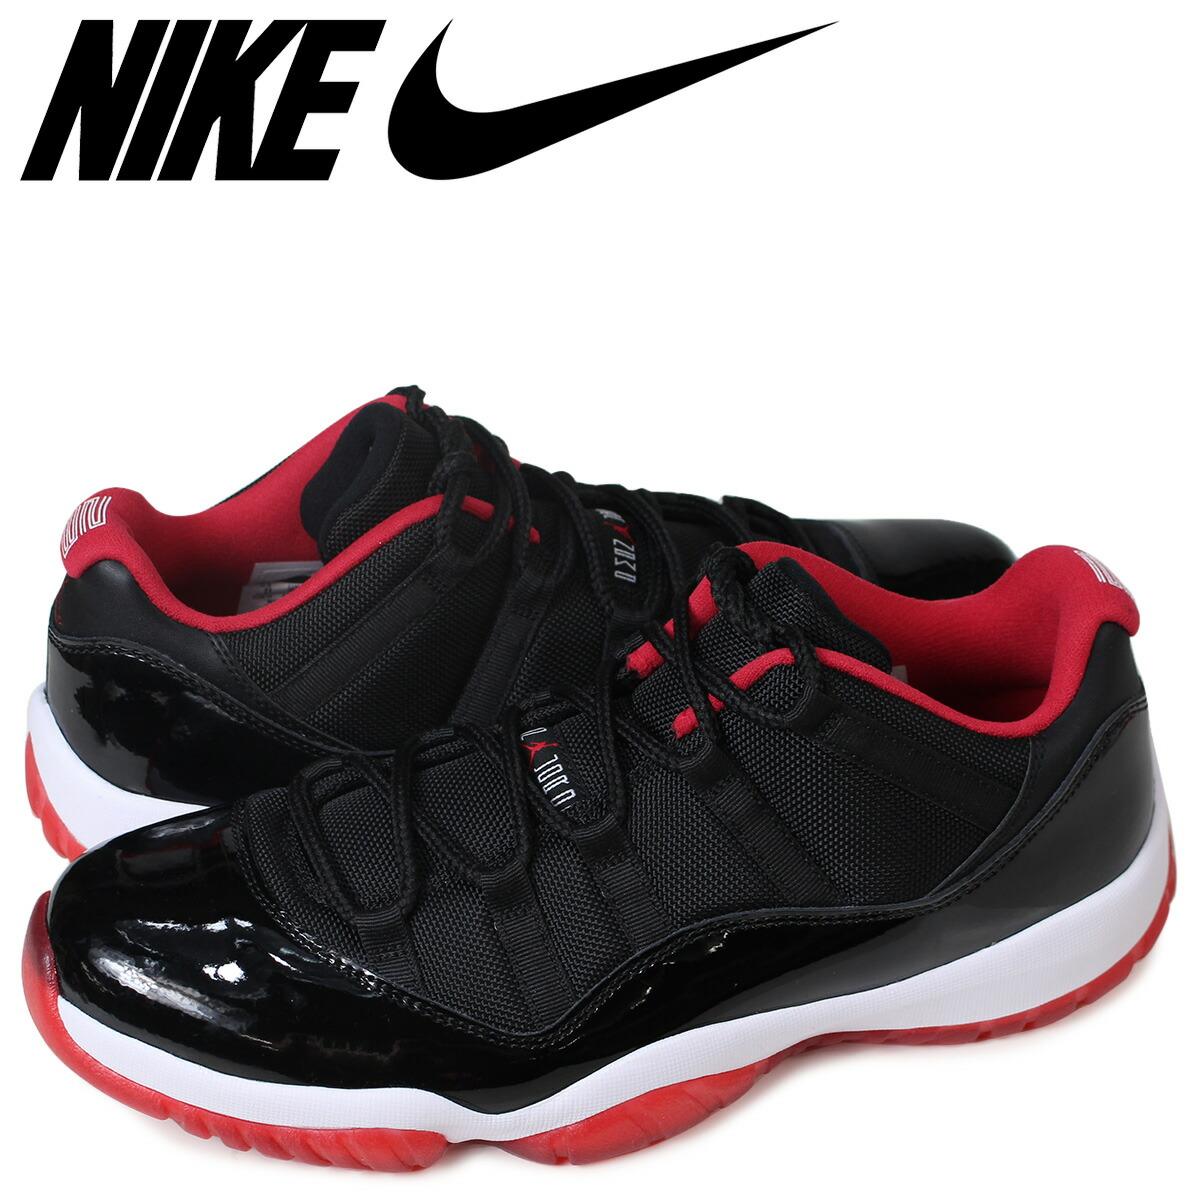 the best attitude c993e 462e8 NIKE AIR JORDAN 11 RETRO LOW Nike Air Jordan 11 nostalgic sneakers  528,895-012 black [185]